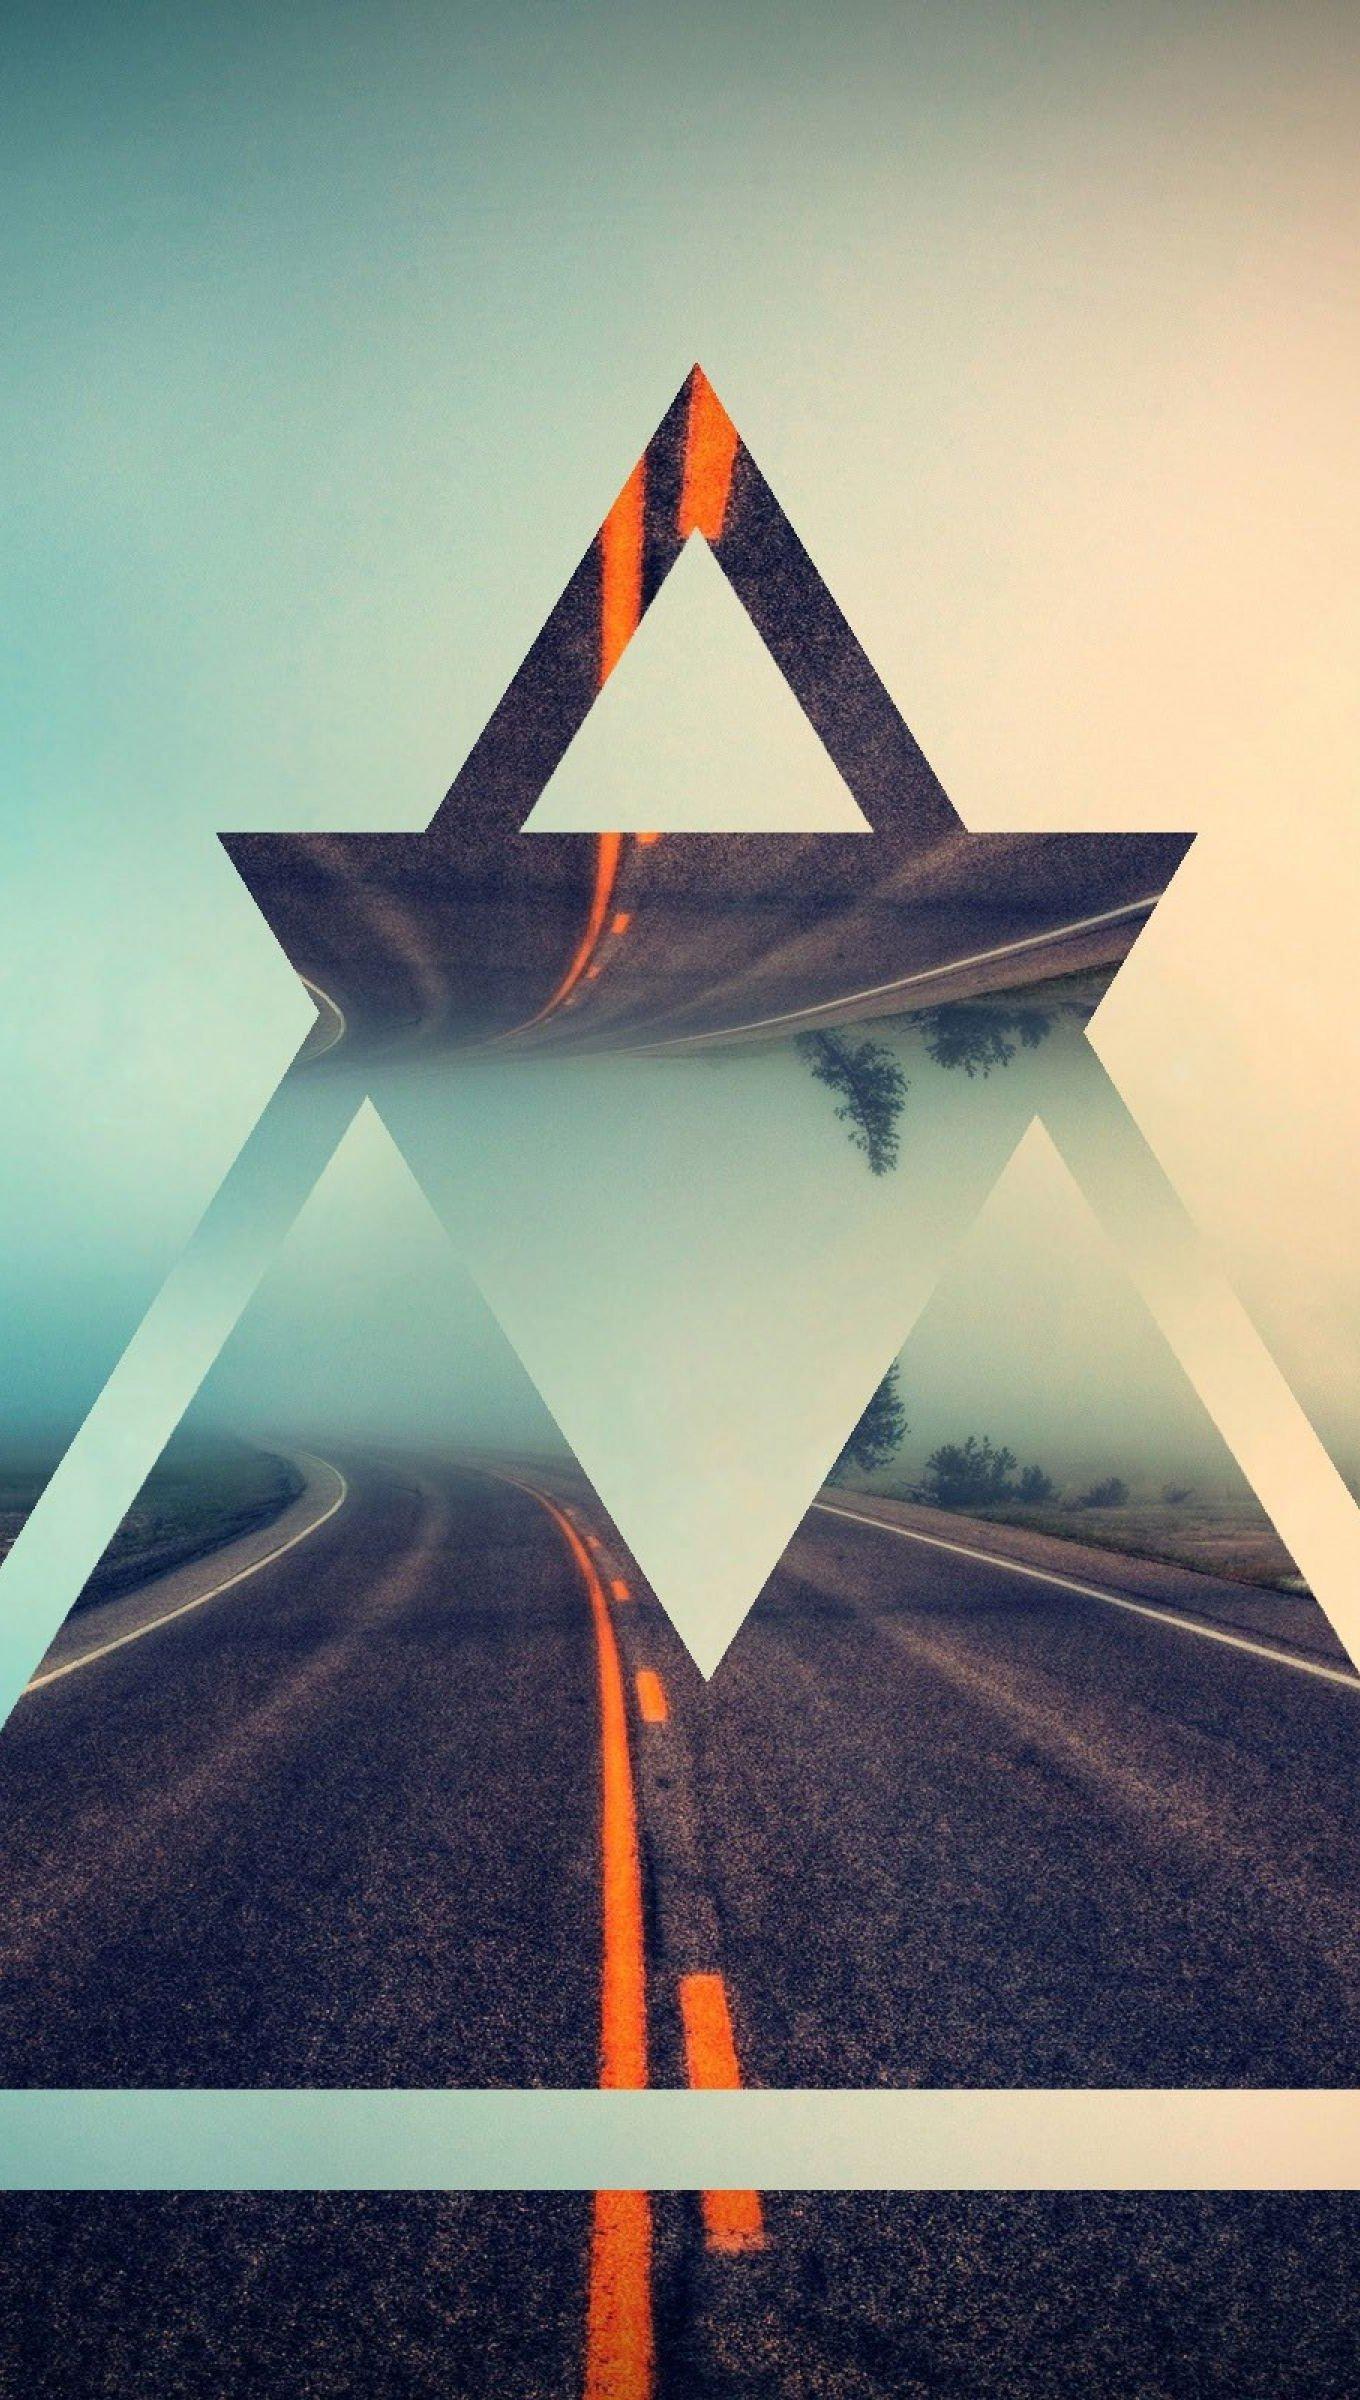 Fondos de pantalla Carretera triángulos Vertical